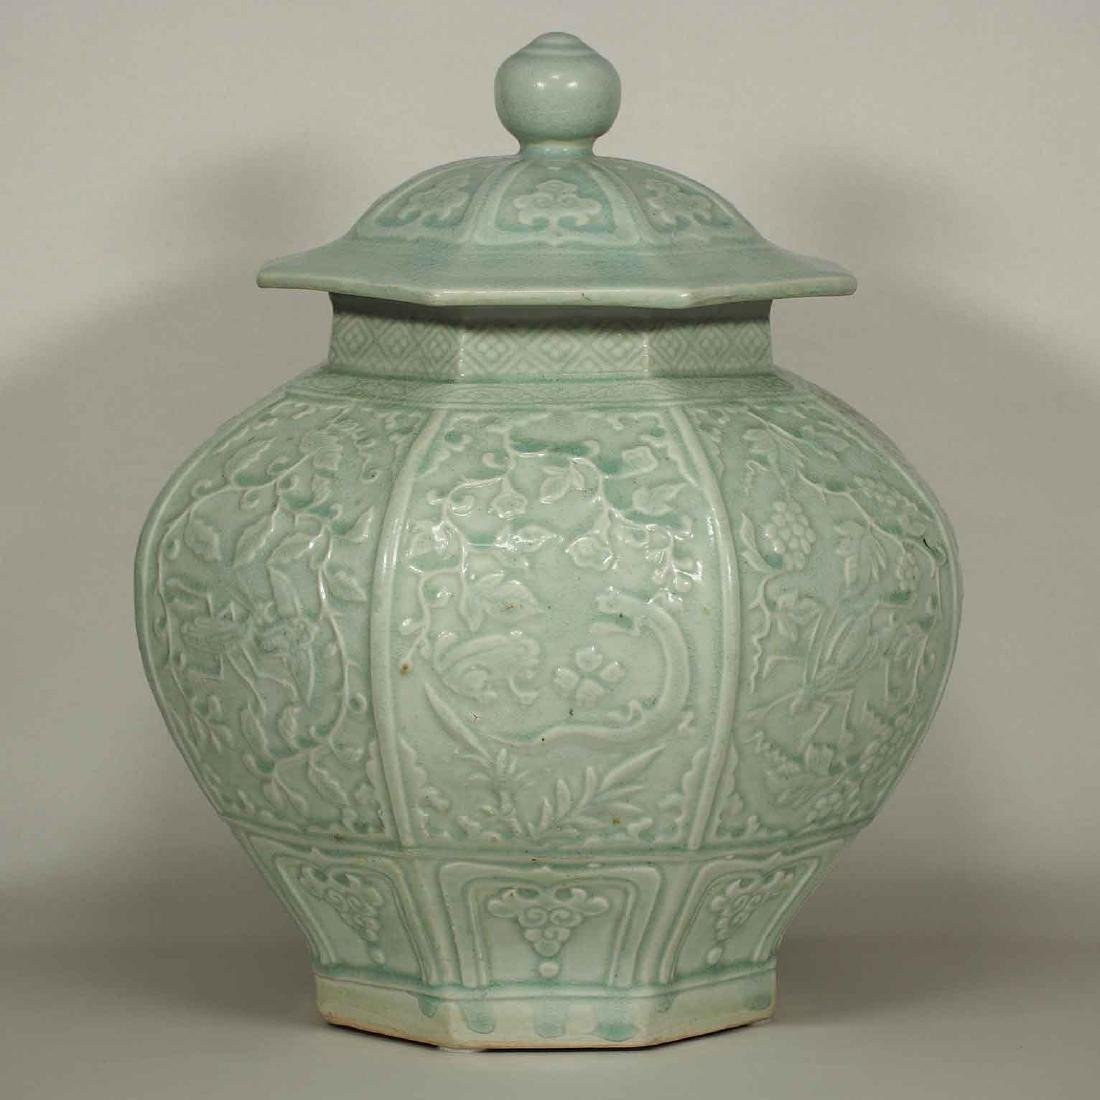 (TL) Octagonal Lidded Jar, late Yuan-early Ming Dynasty